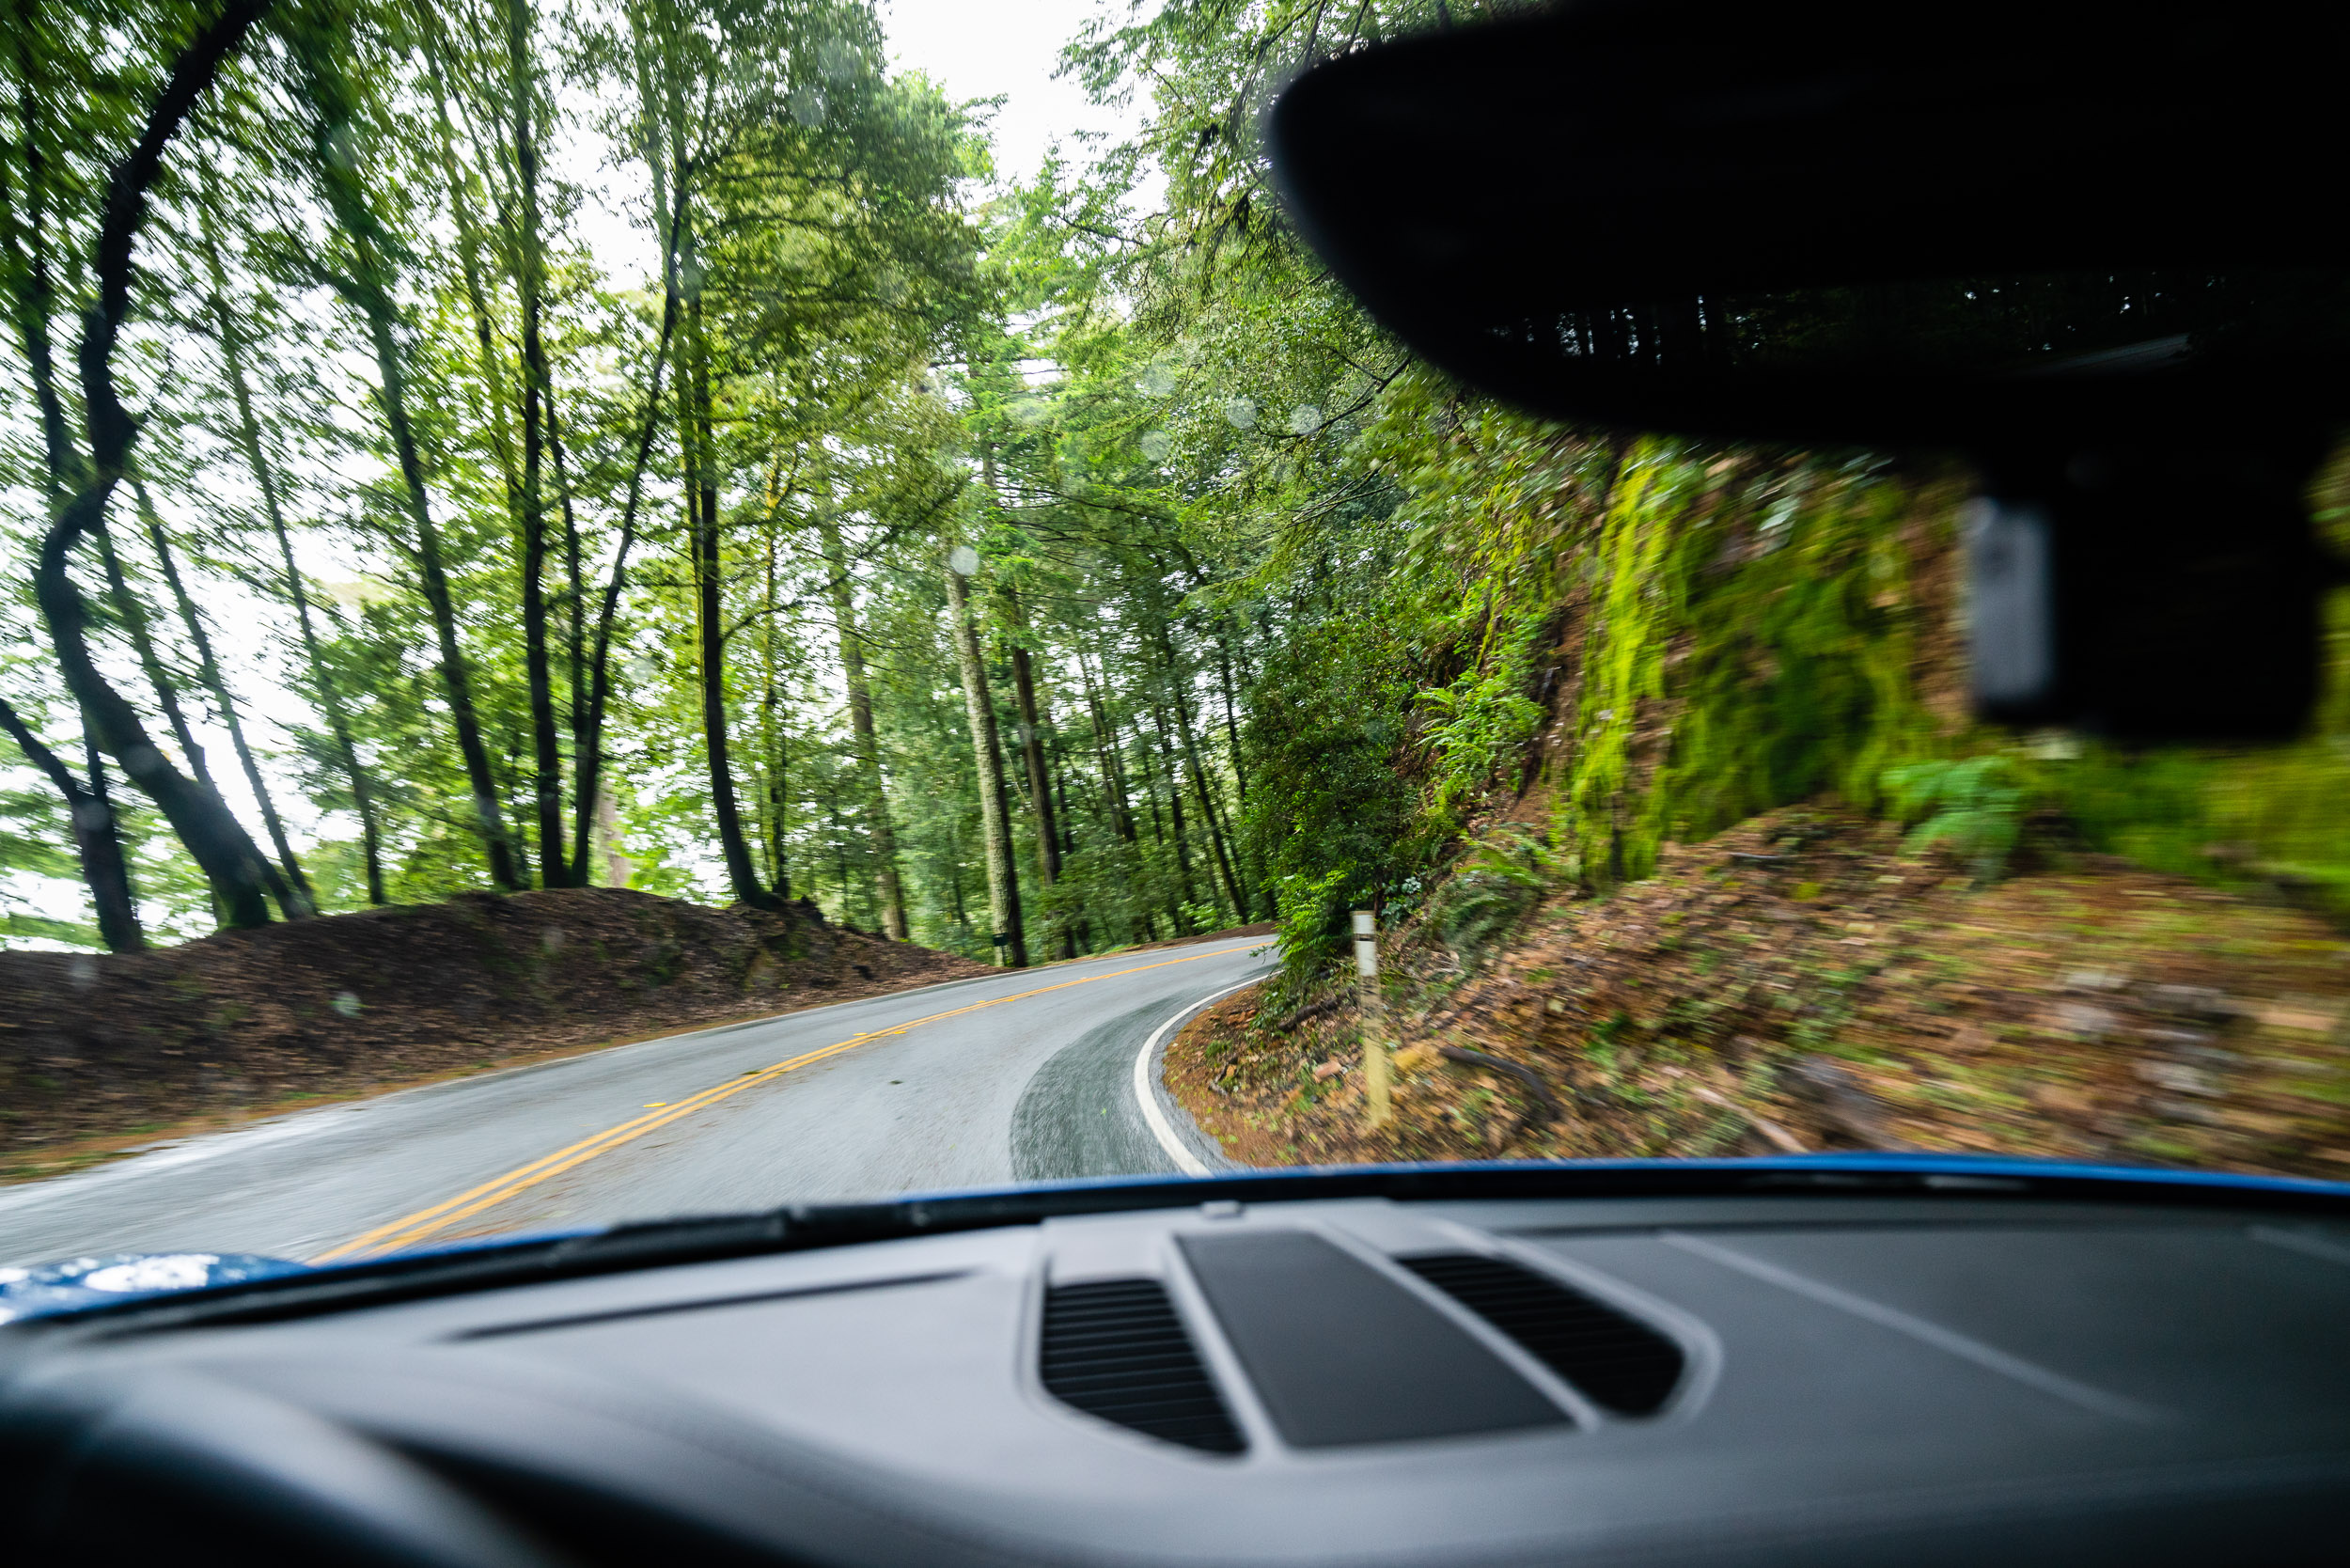 porsche-911-gt3-touge-interior-shot.jpg